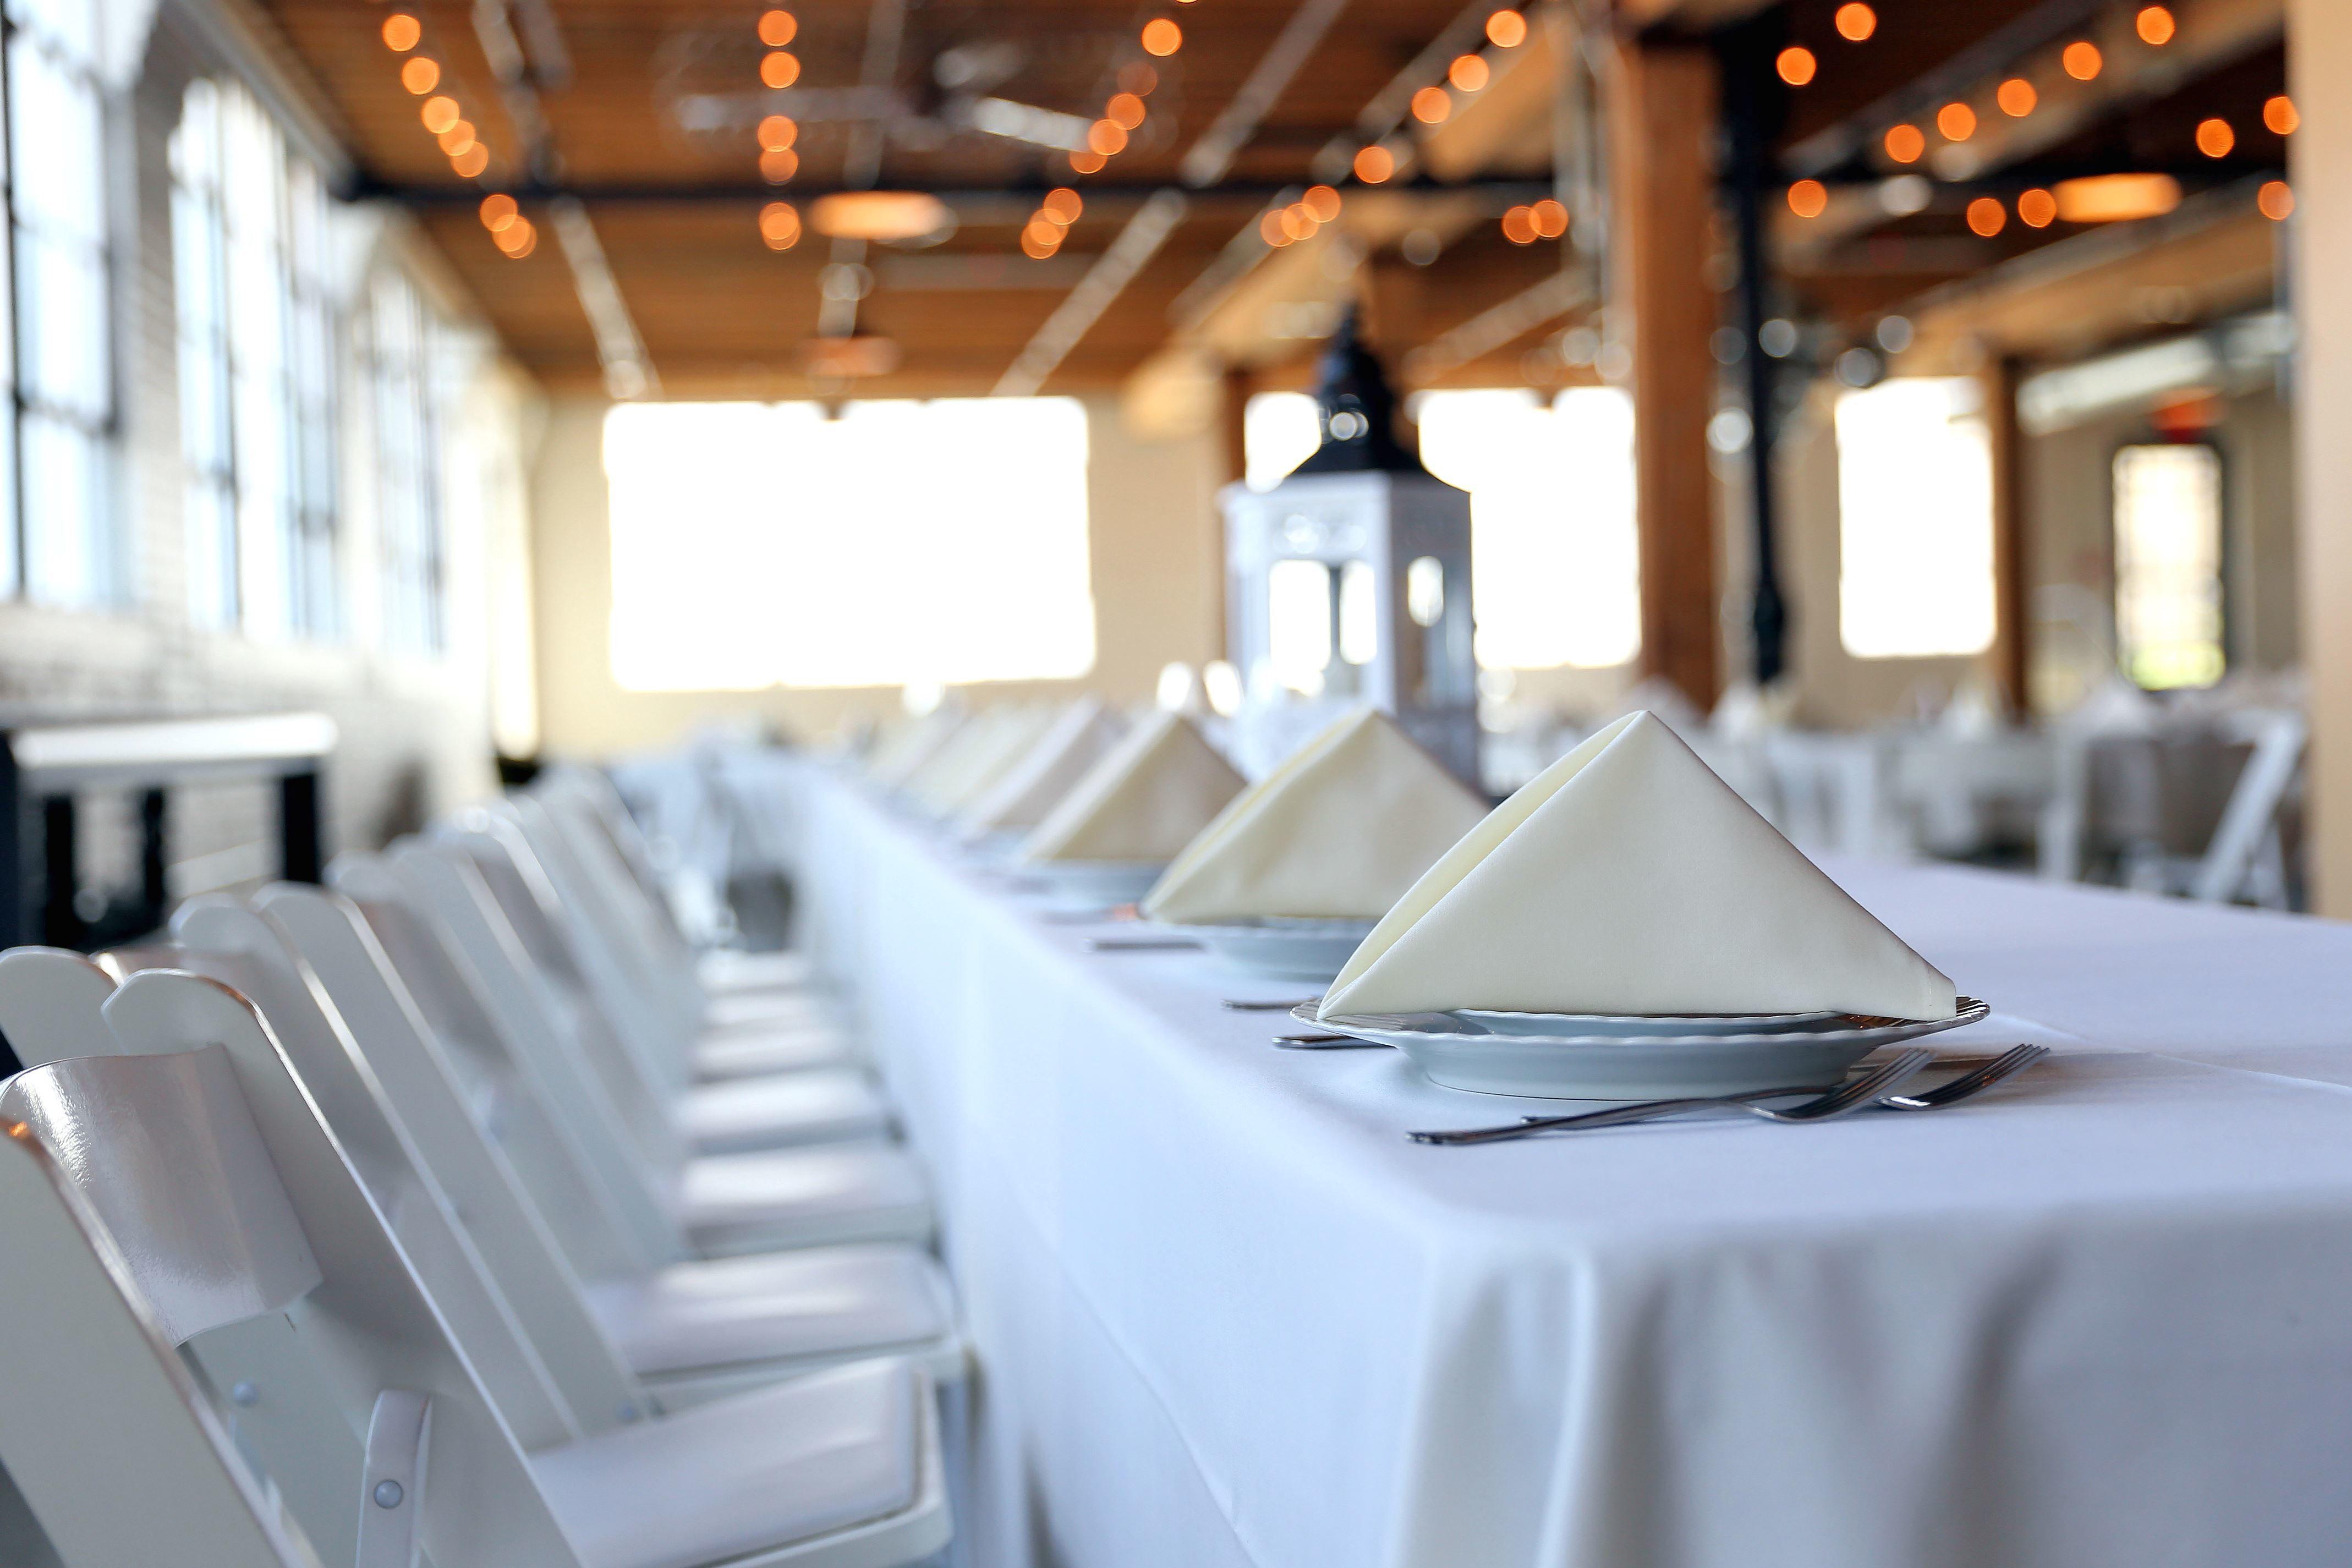 Image libre Table amnagement luxe propre restaurant fentre salle  manger chambre